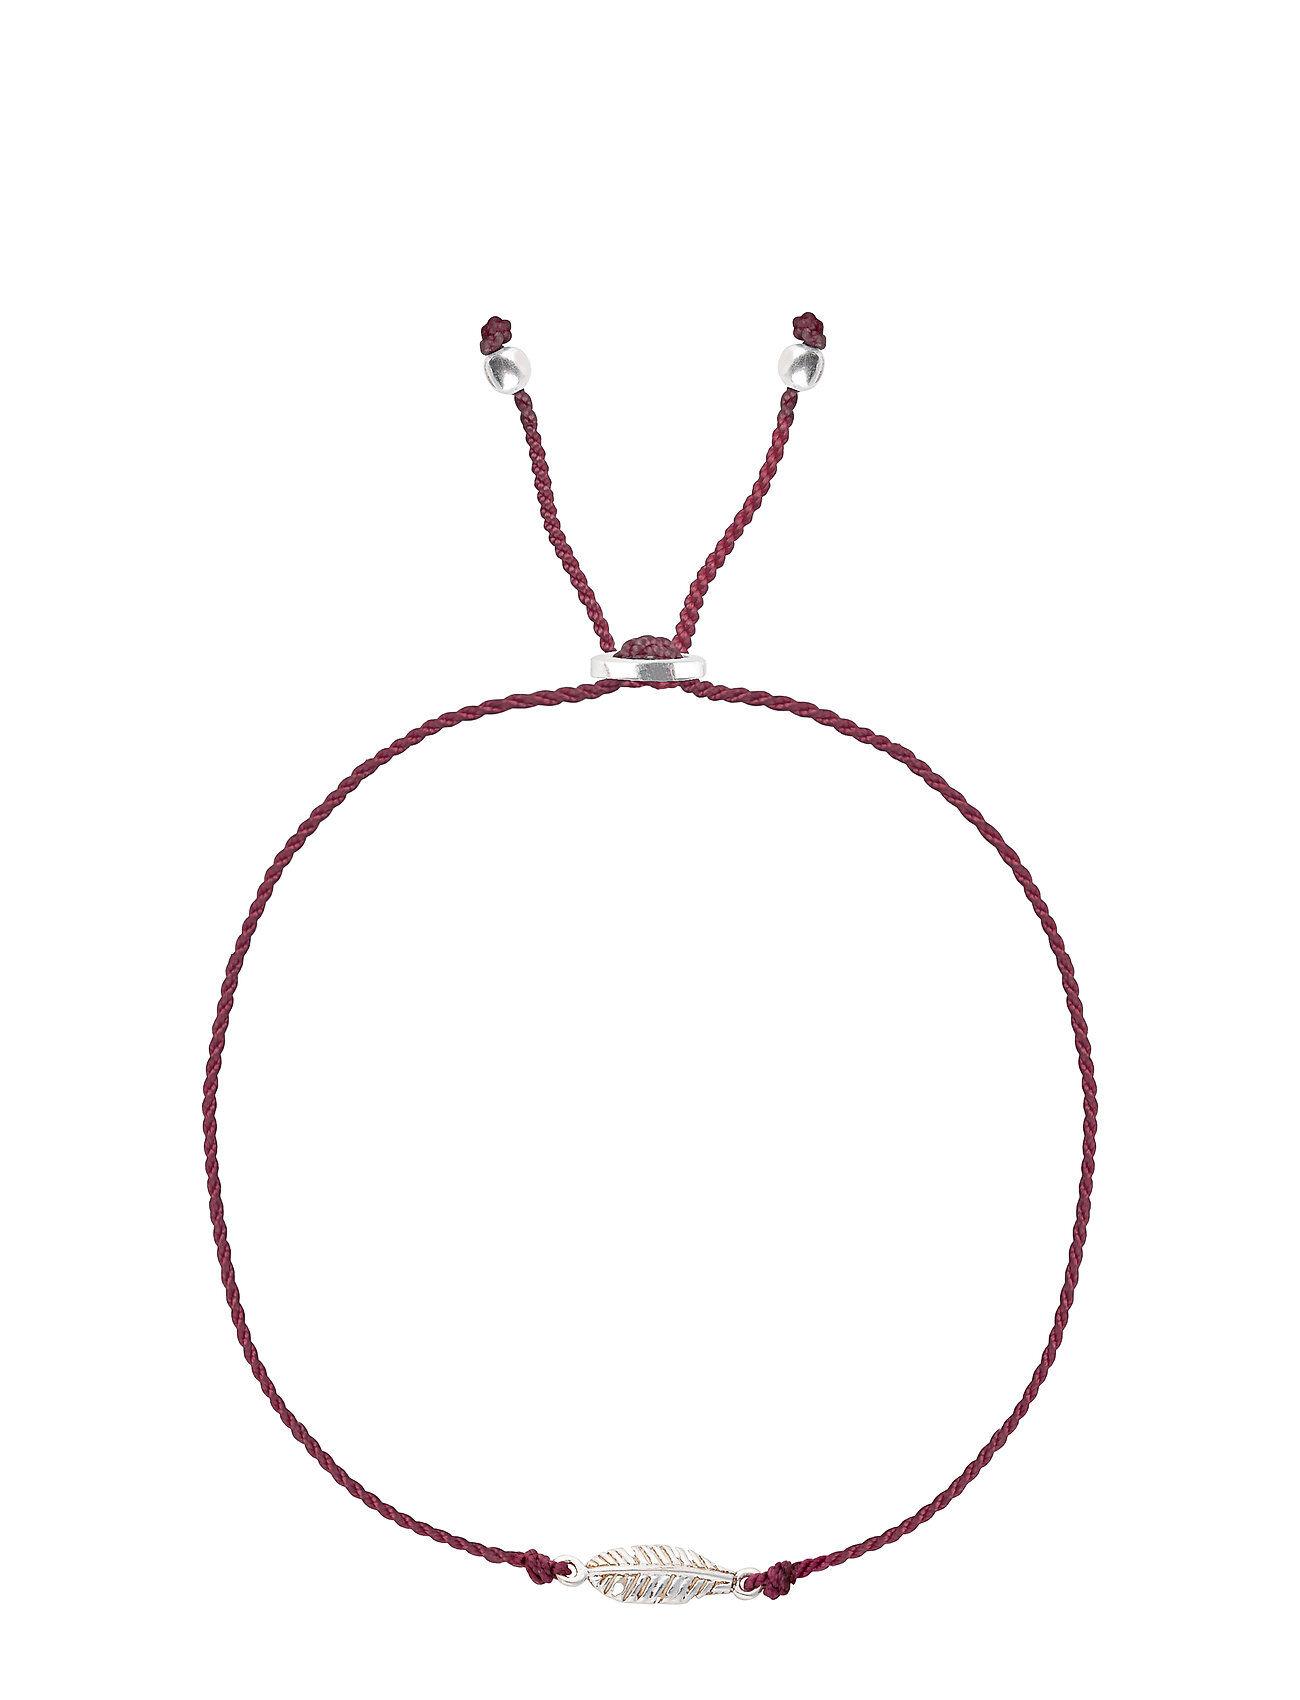 Syster P Sparkle Bracelet Feather Silver Grape Accessories Jewellery Bracelets Chain Bracelets Vaaleanpunainen Syster P